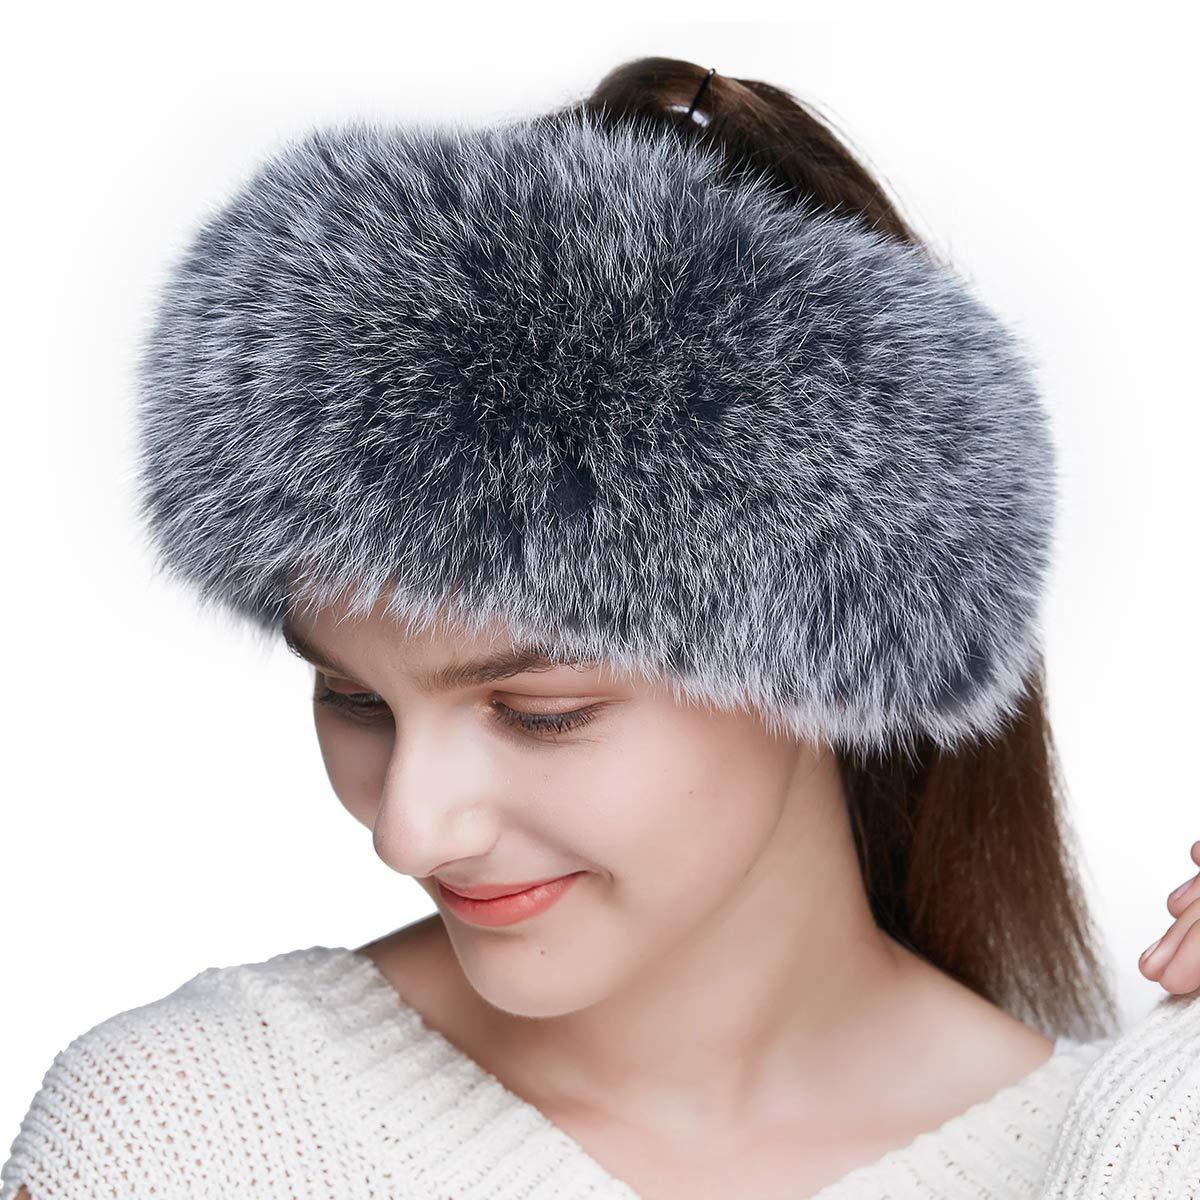 ENJOYFUR Fur Headband,Winter Headband Earwarmers,Stretchable Fox Fur Headband Winter Earmuffs for Women